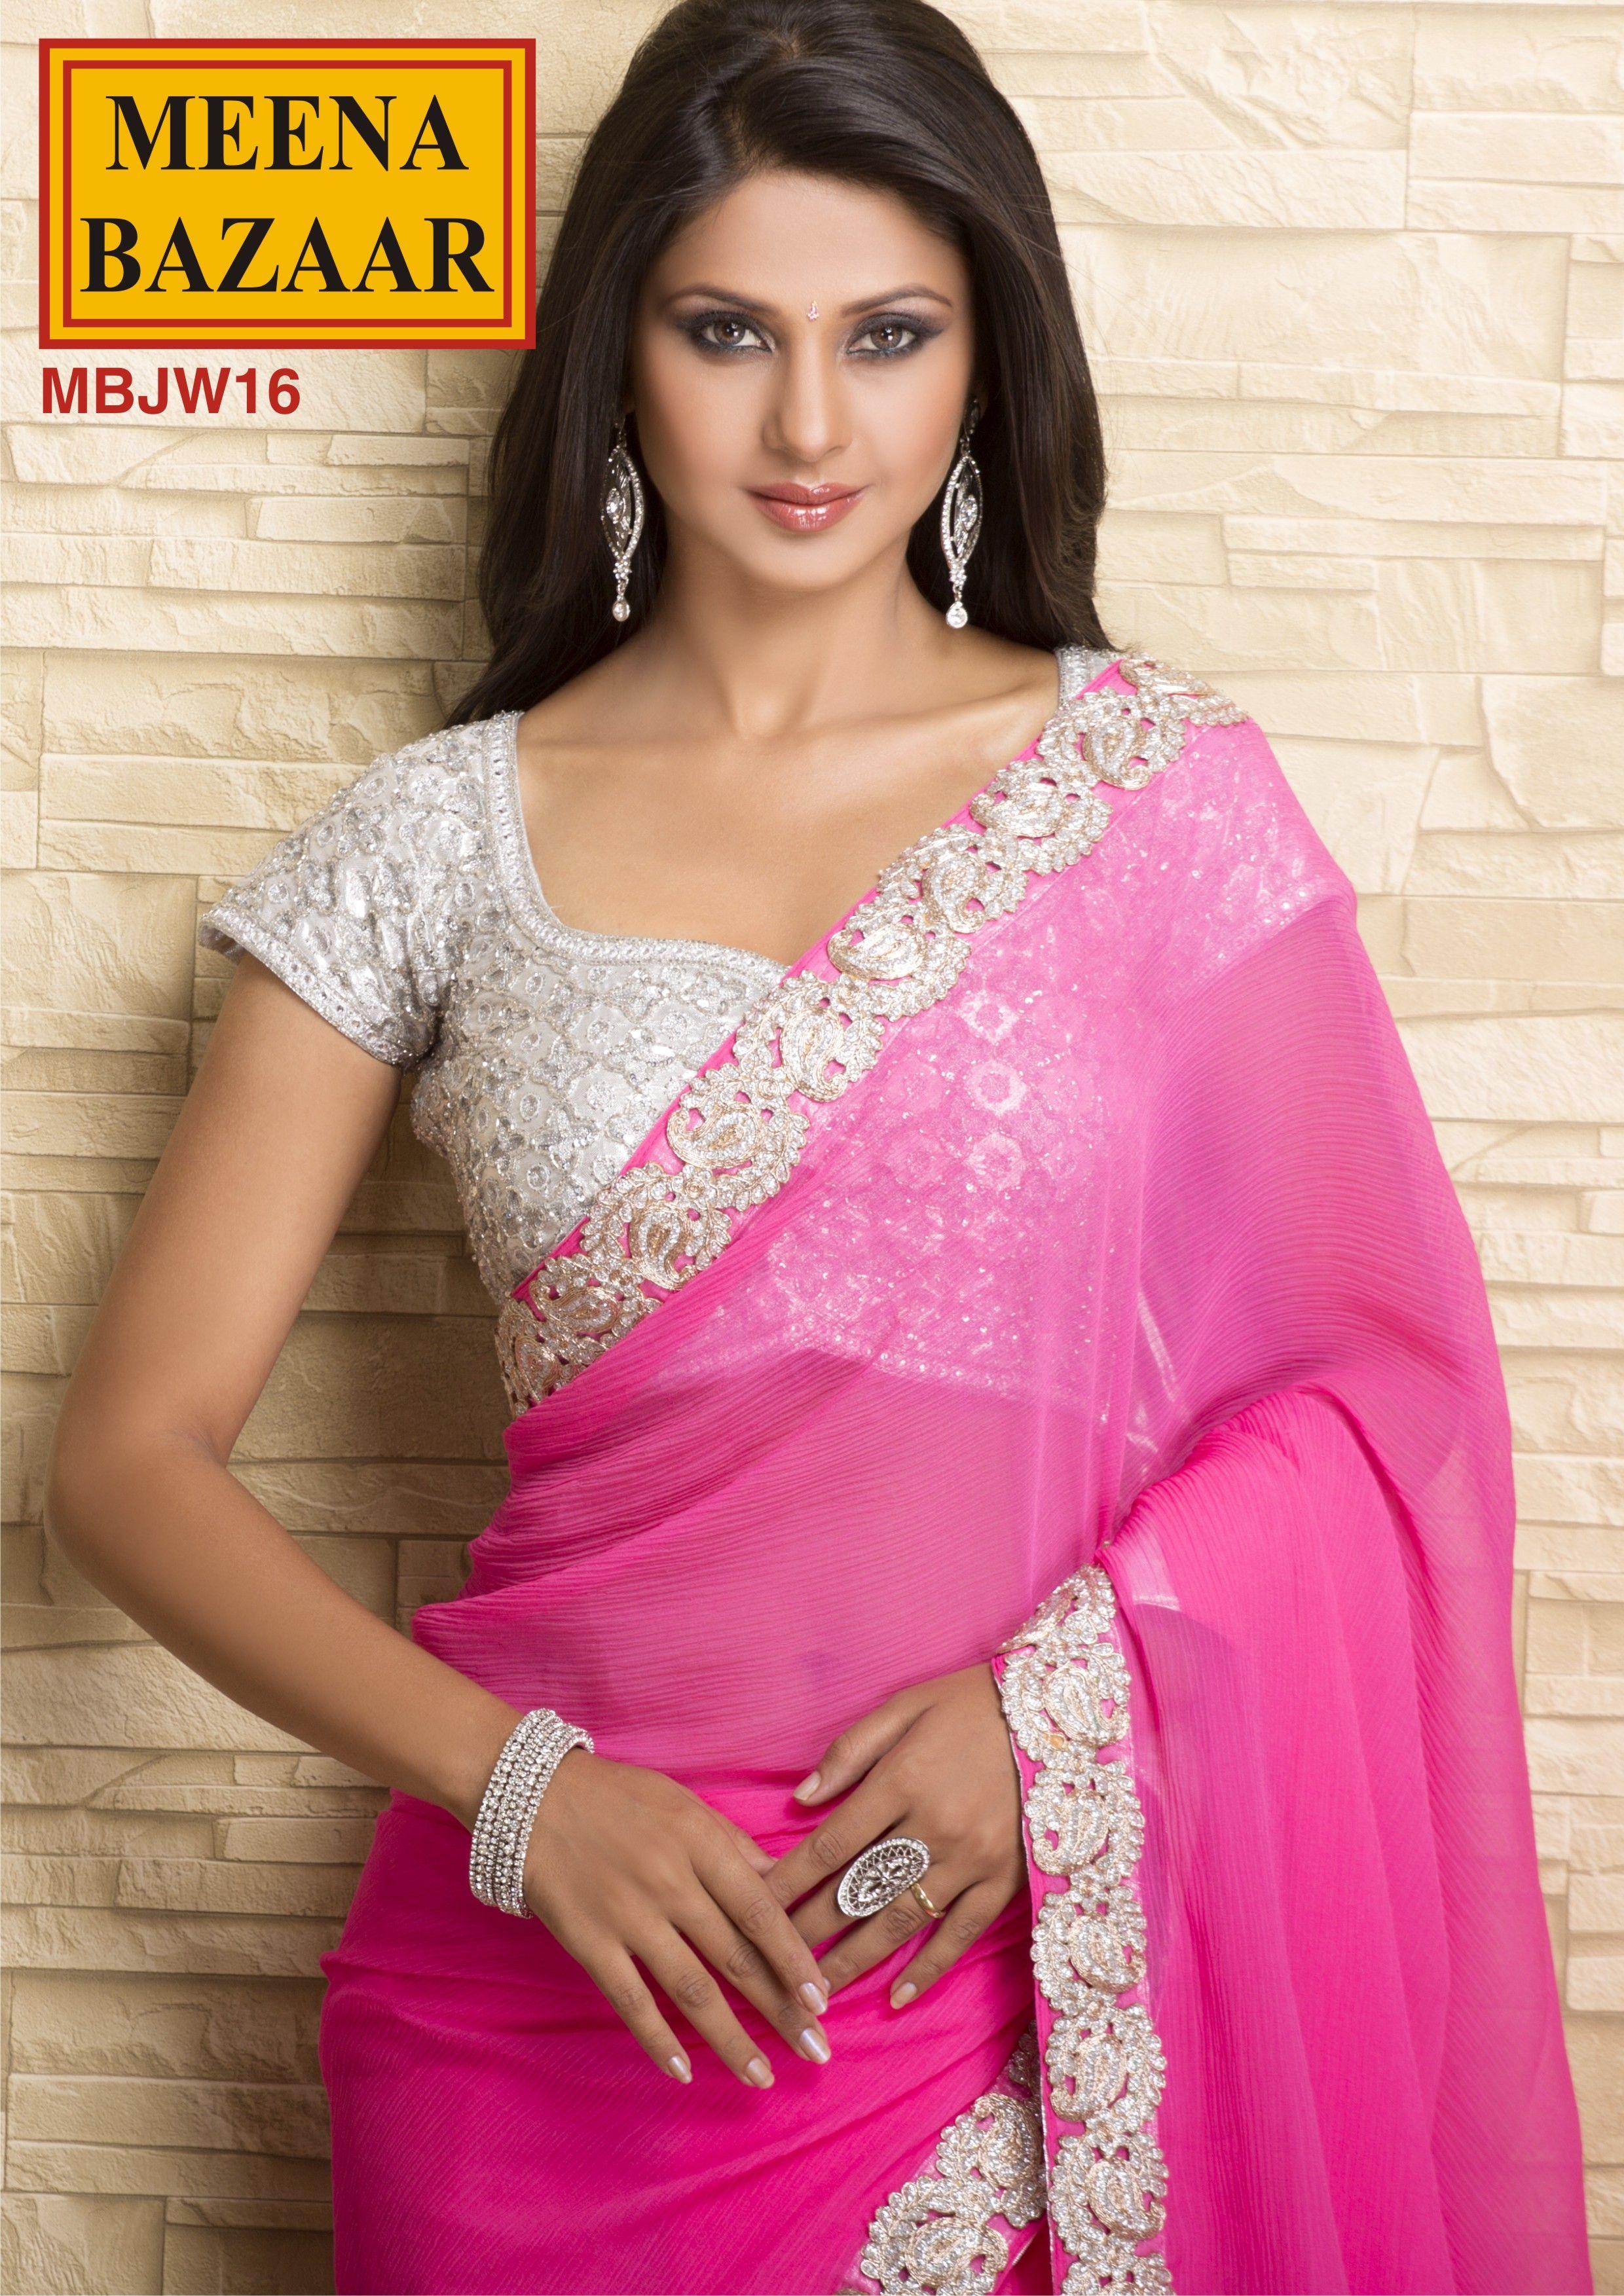 MBJW16 Border Patch Saree on Chiffon Fabric   money gone   Pinterest